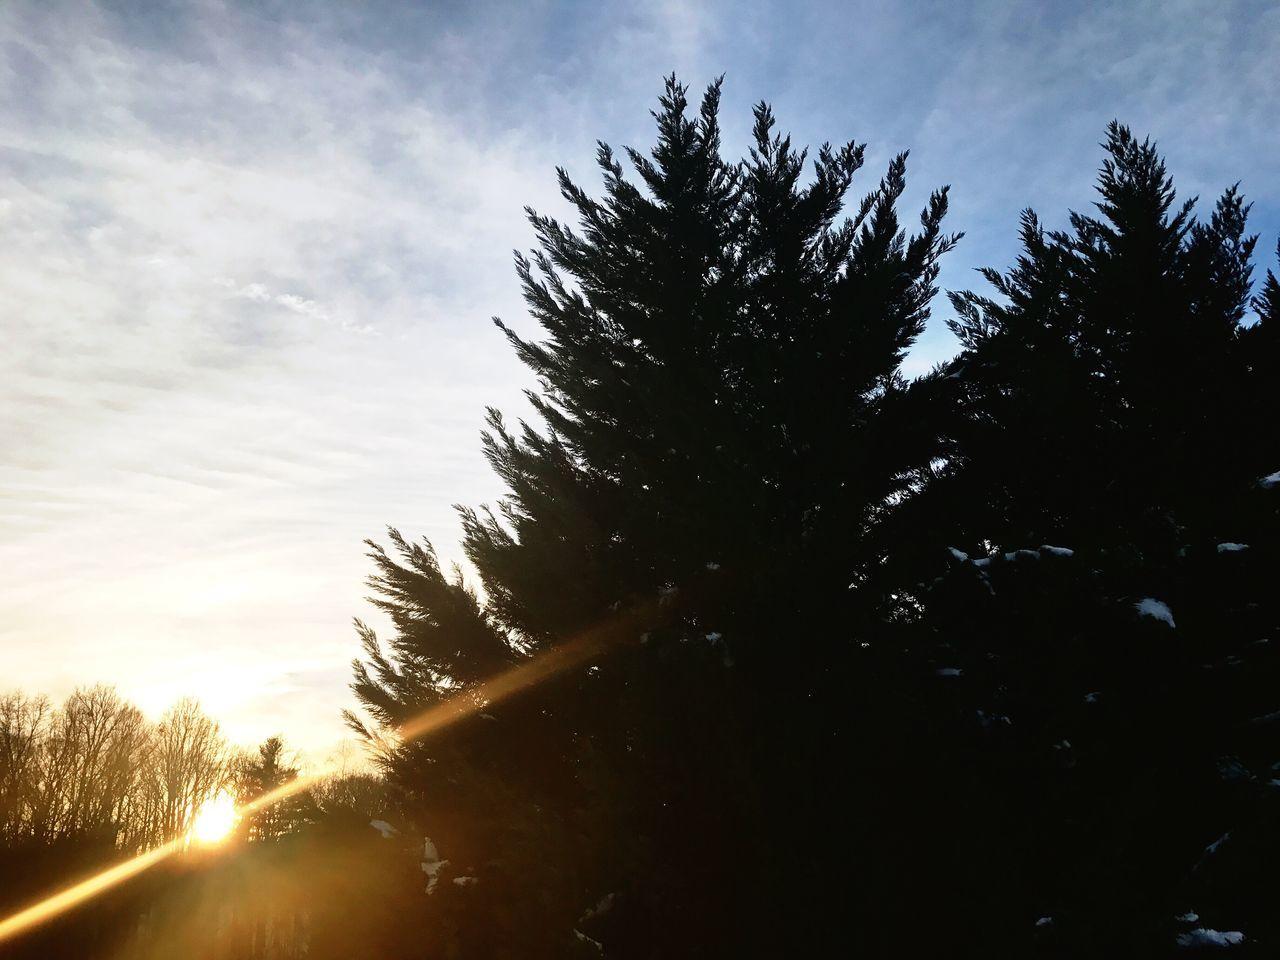 Dawsonville, GA. United States. Nature Trees Sun Sunset Sun Glare Sky Day Outside EyeEmNewHere Treescollection Trees And Nature Trees And Sky Sky And Trees Sky_collection Sunsetlover Sunset_collection Sun_collection, Sky_collection, Cloudporn, Skyporn Treescape